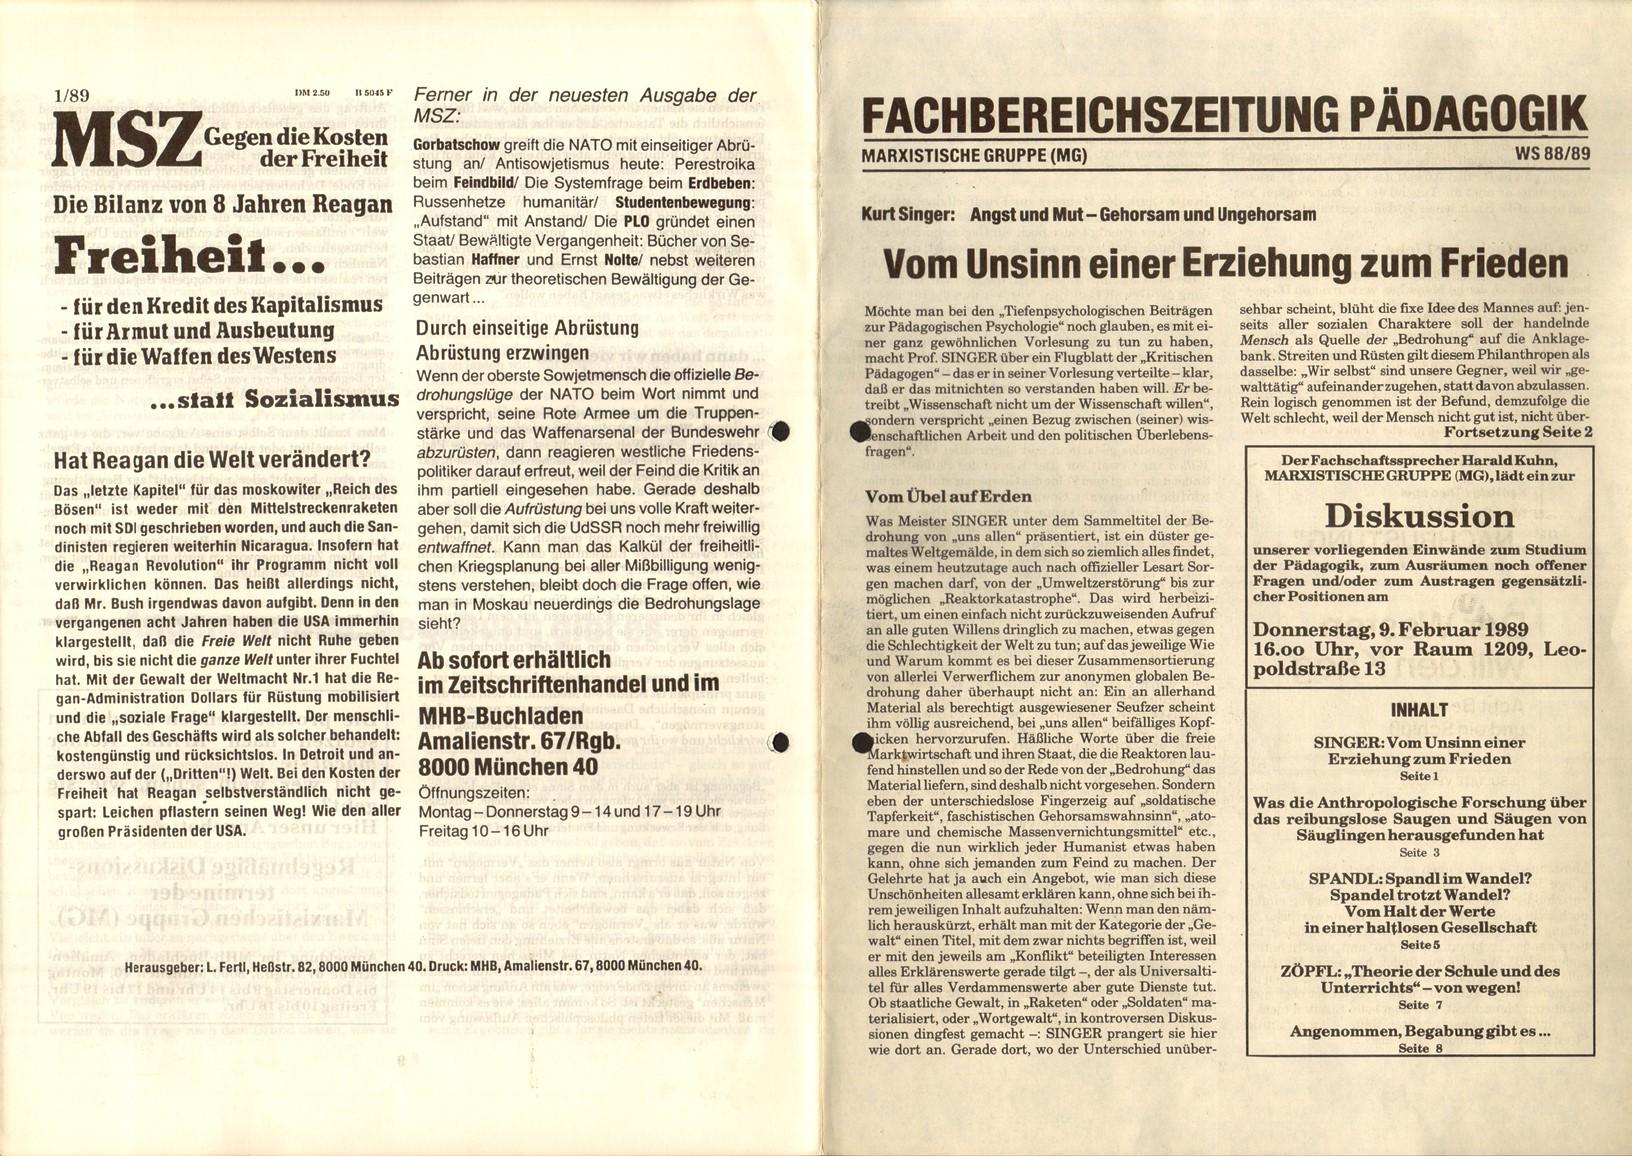 Muenchen_MG_FB_Paedagogik_19881001_01